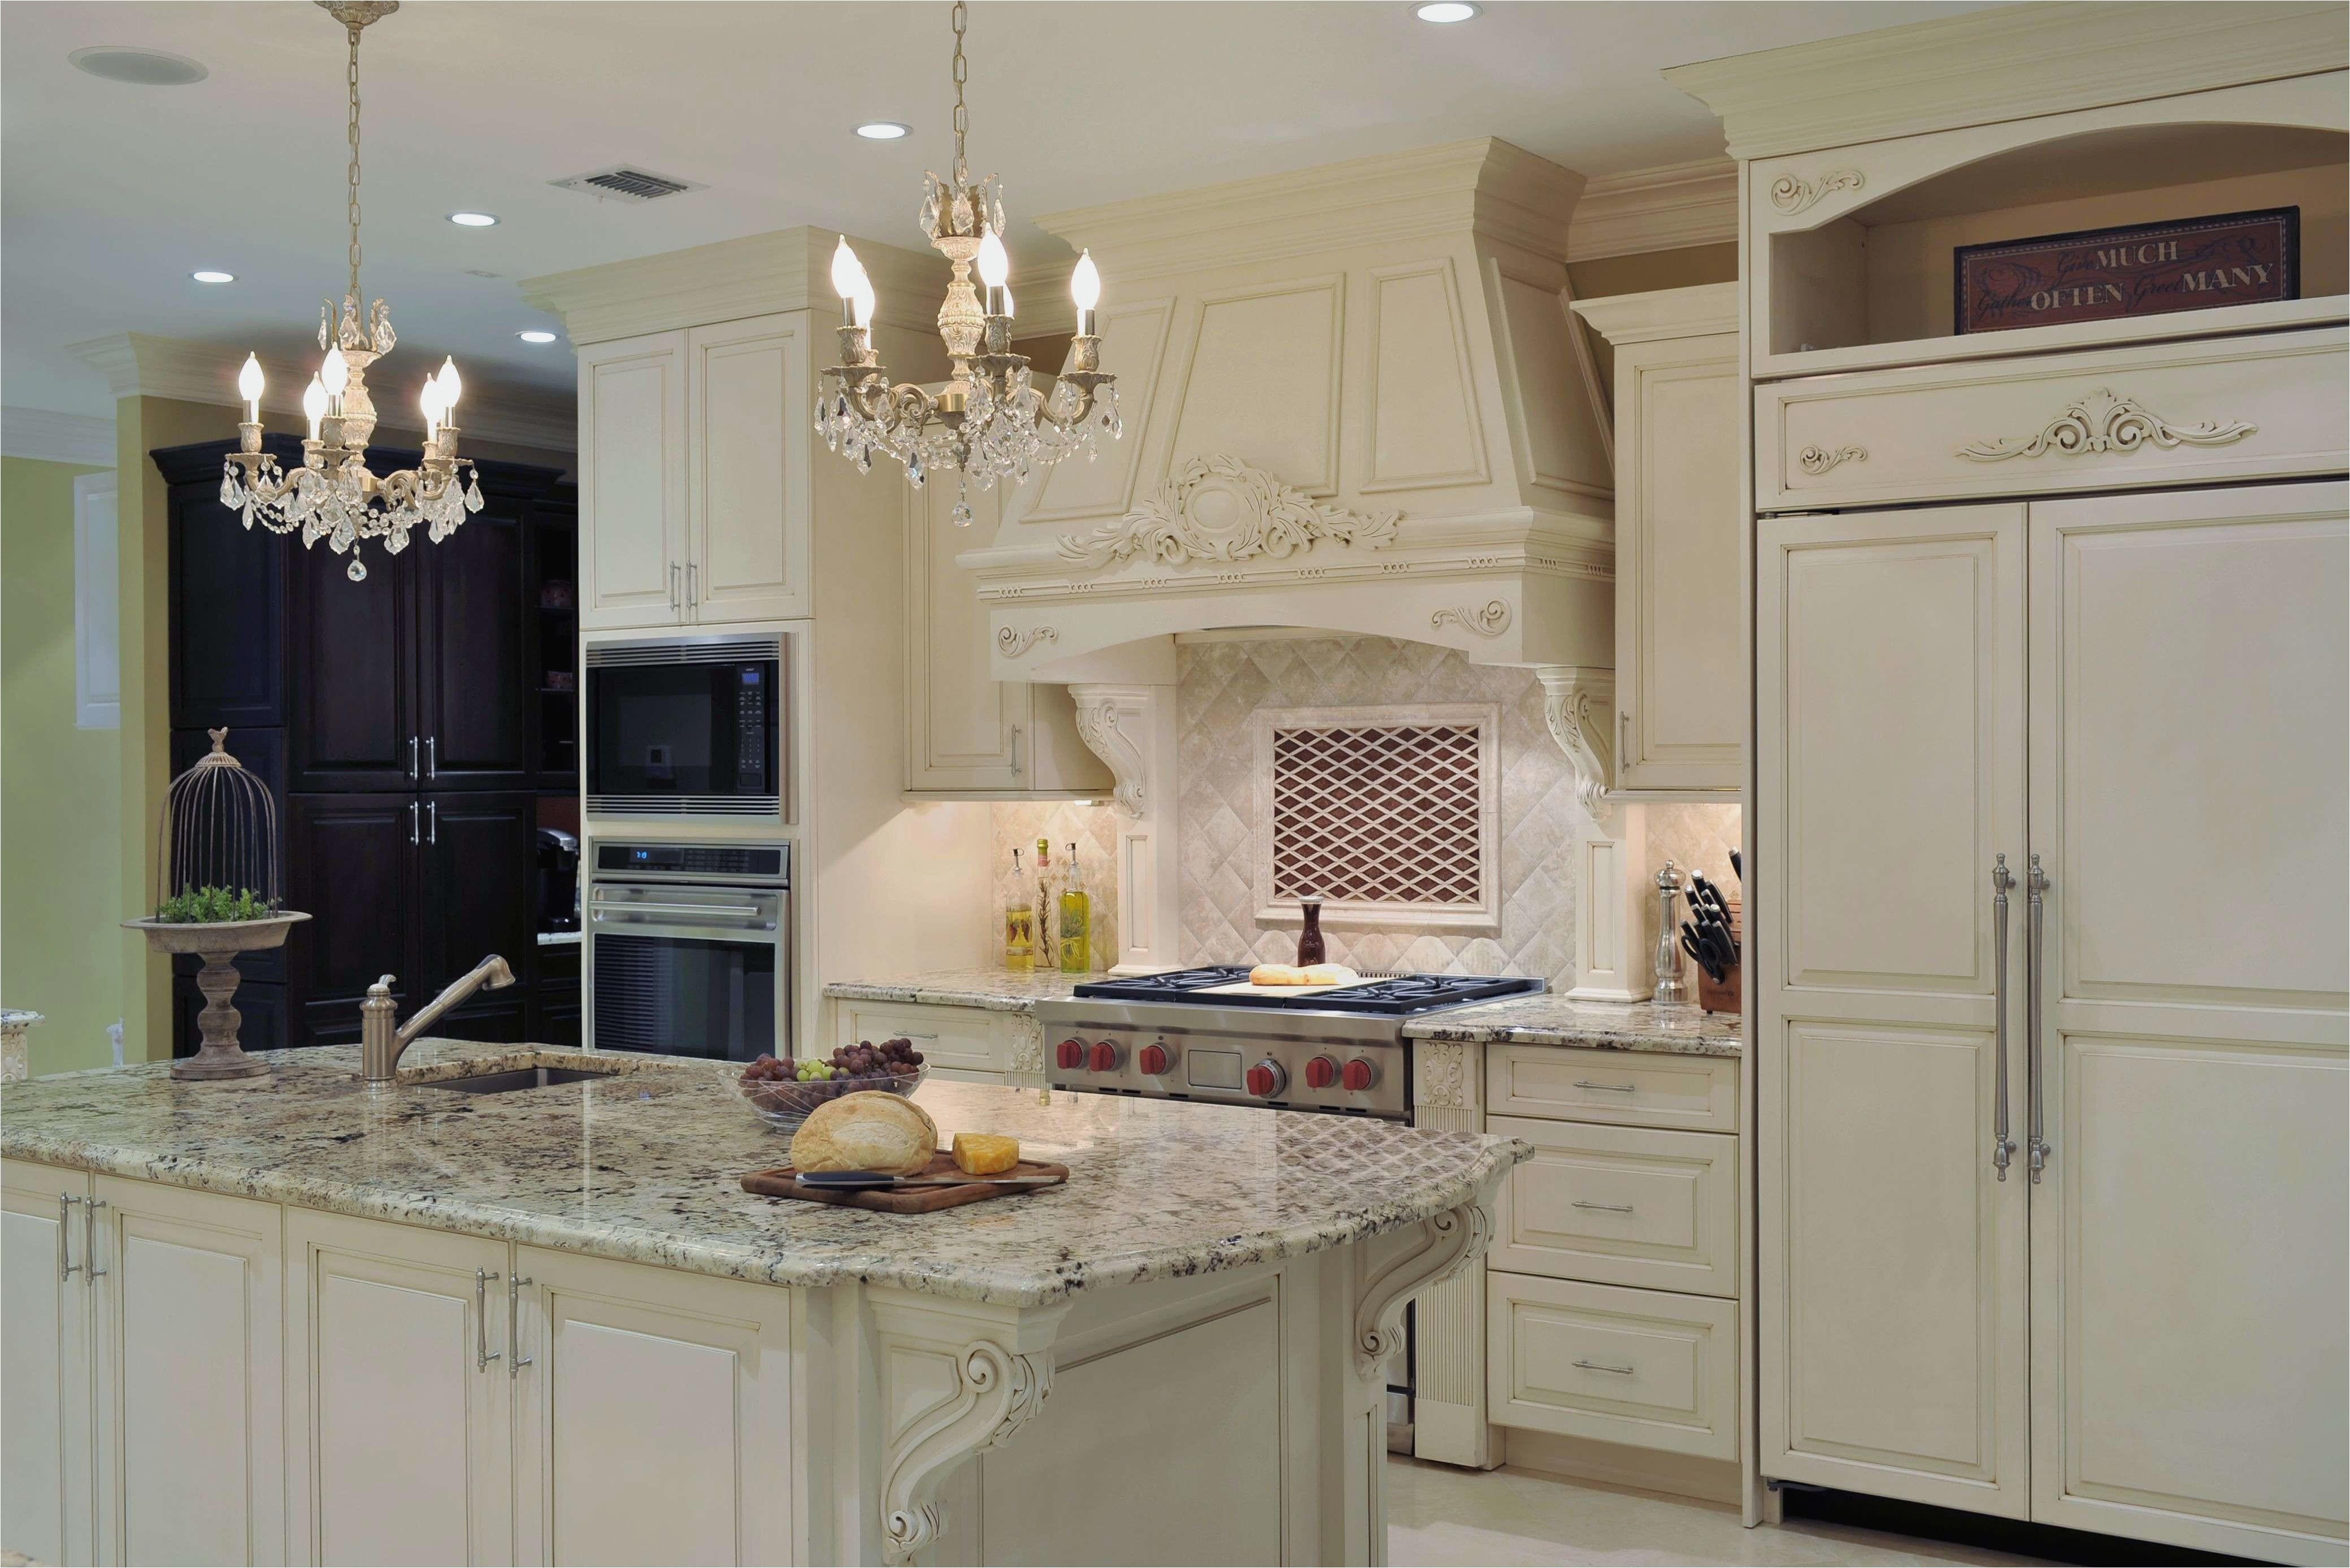 Kitchen Cabinet Ideas for Small Kitchens Unique Exclusive Kitchen Designs Alluring Kitchen Cabinet 0d Bright Lights